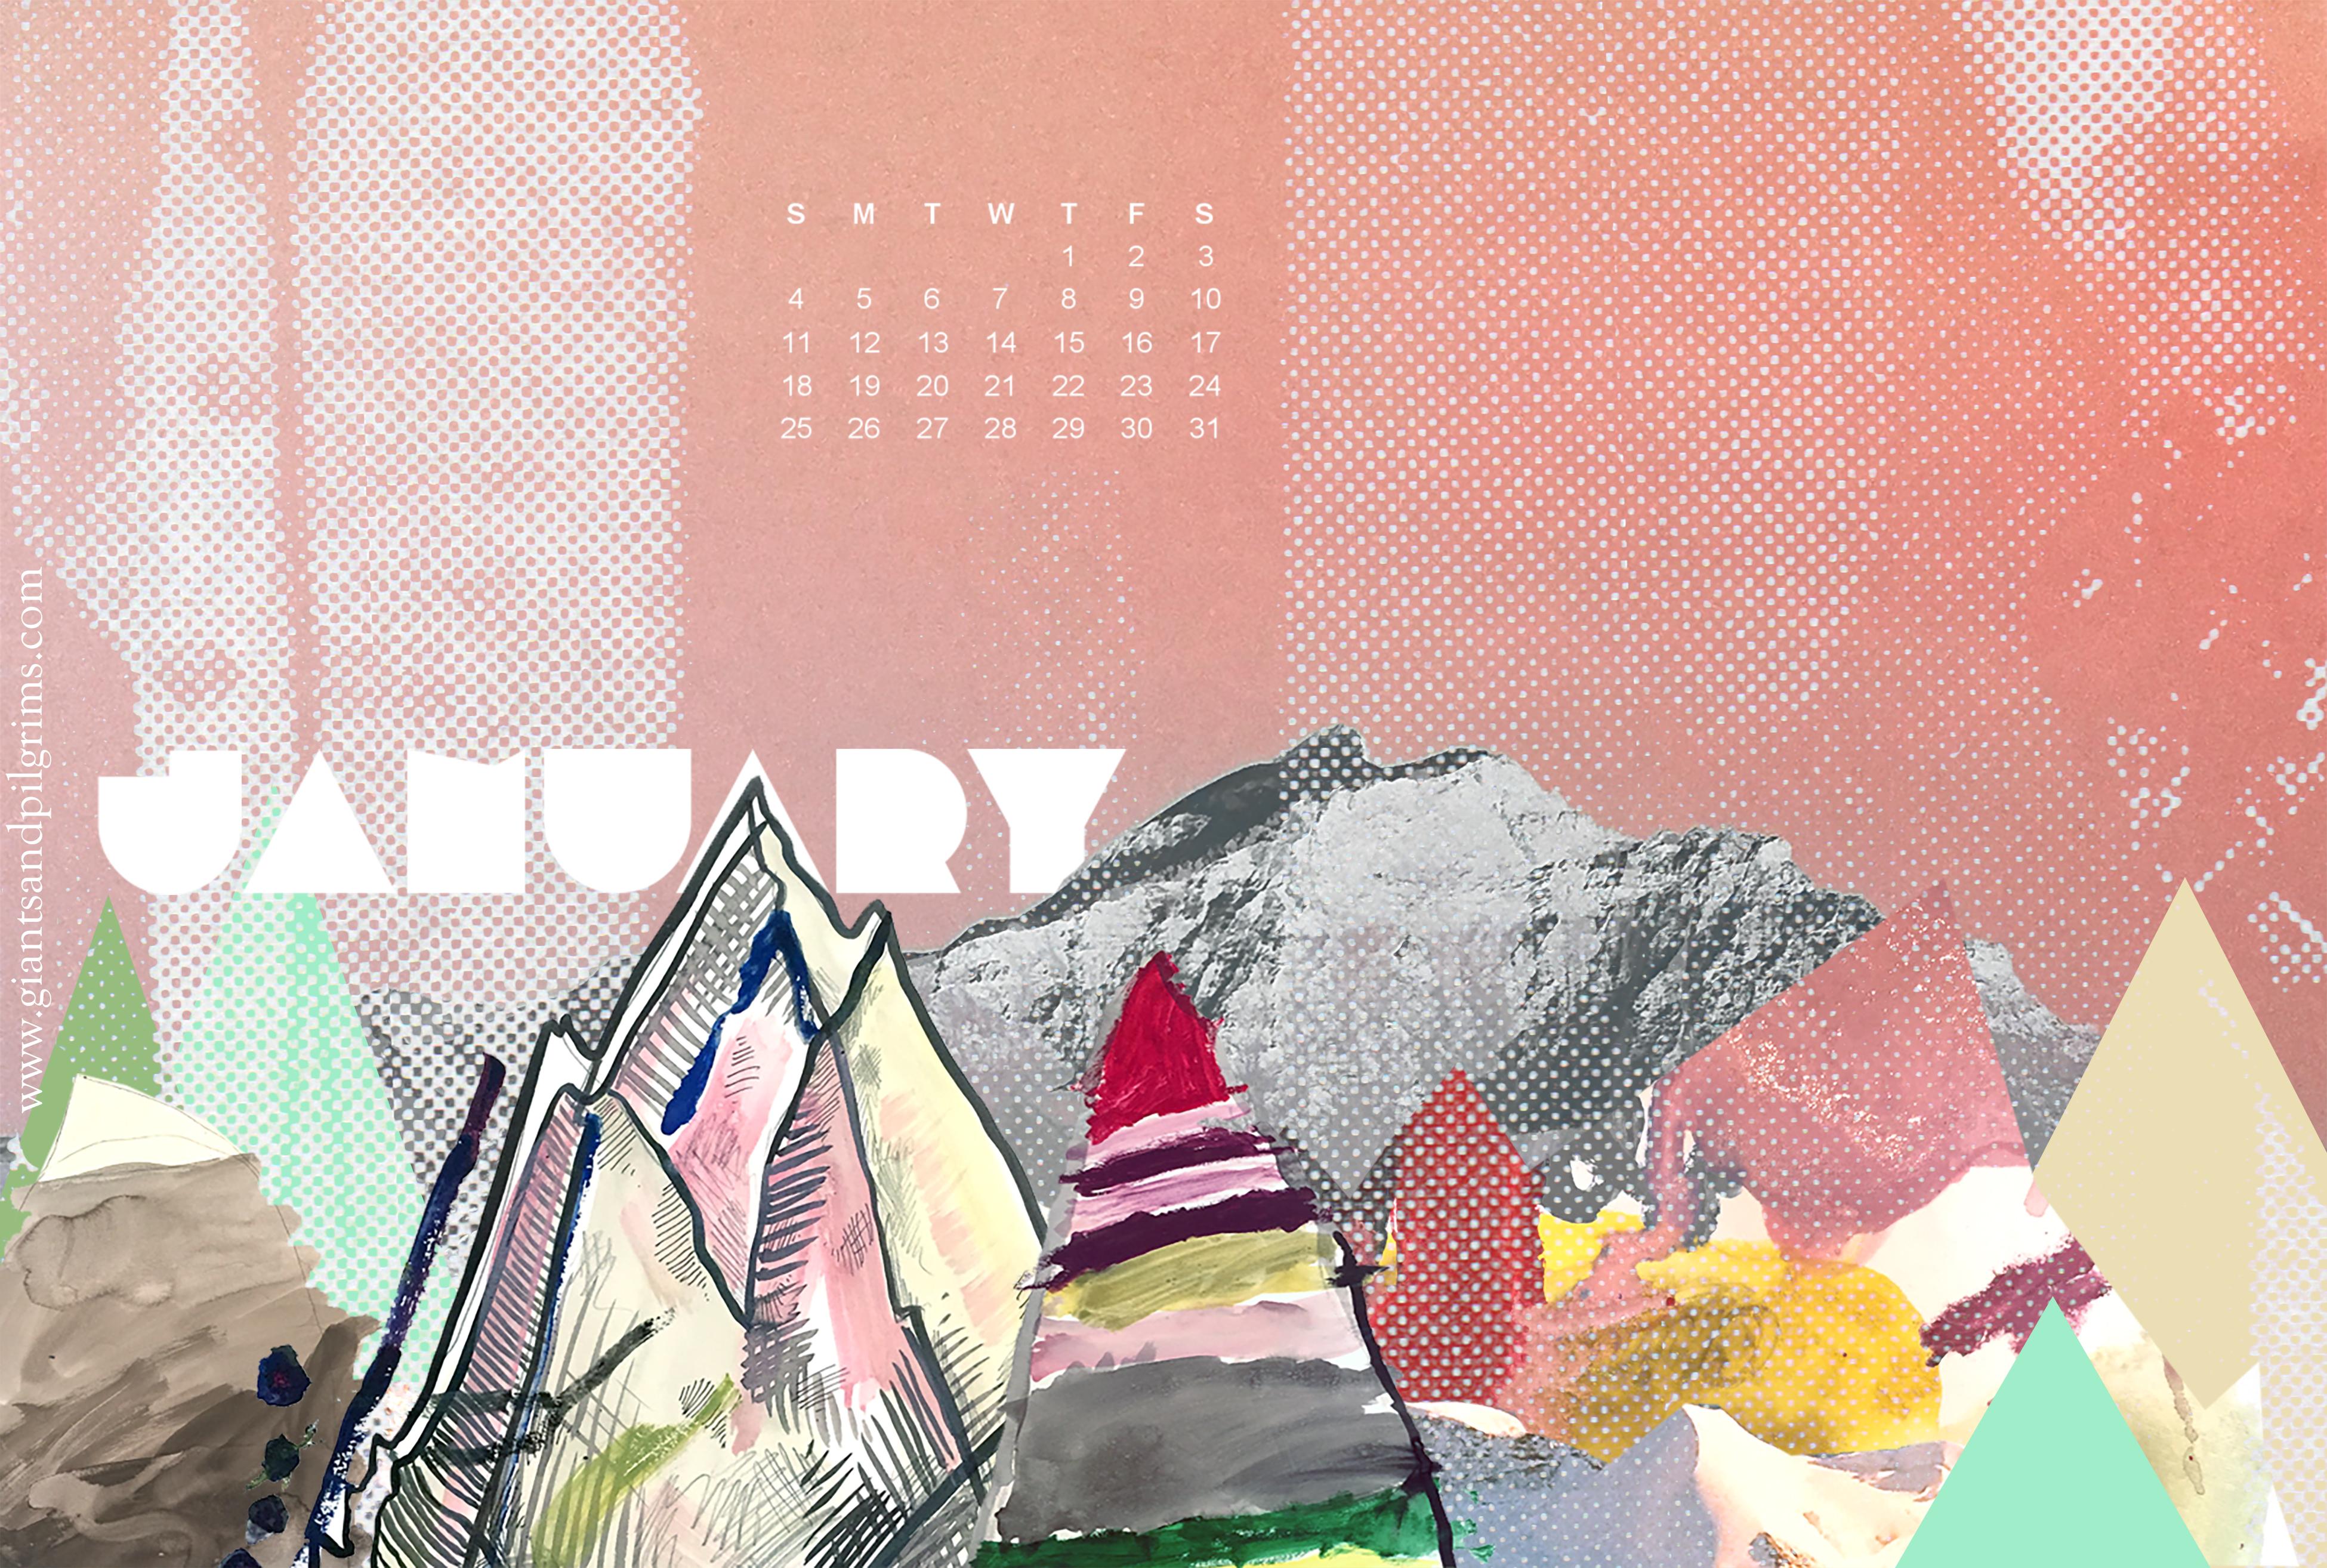 January 2015 Desktop and Phone Wallpaper Giants Pilgrims 3900x2628